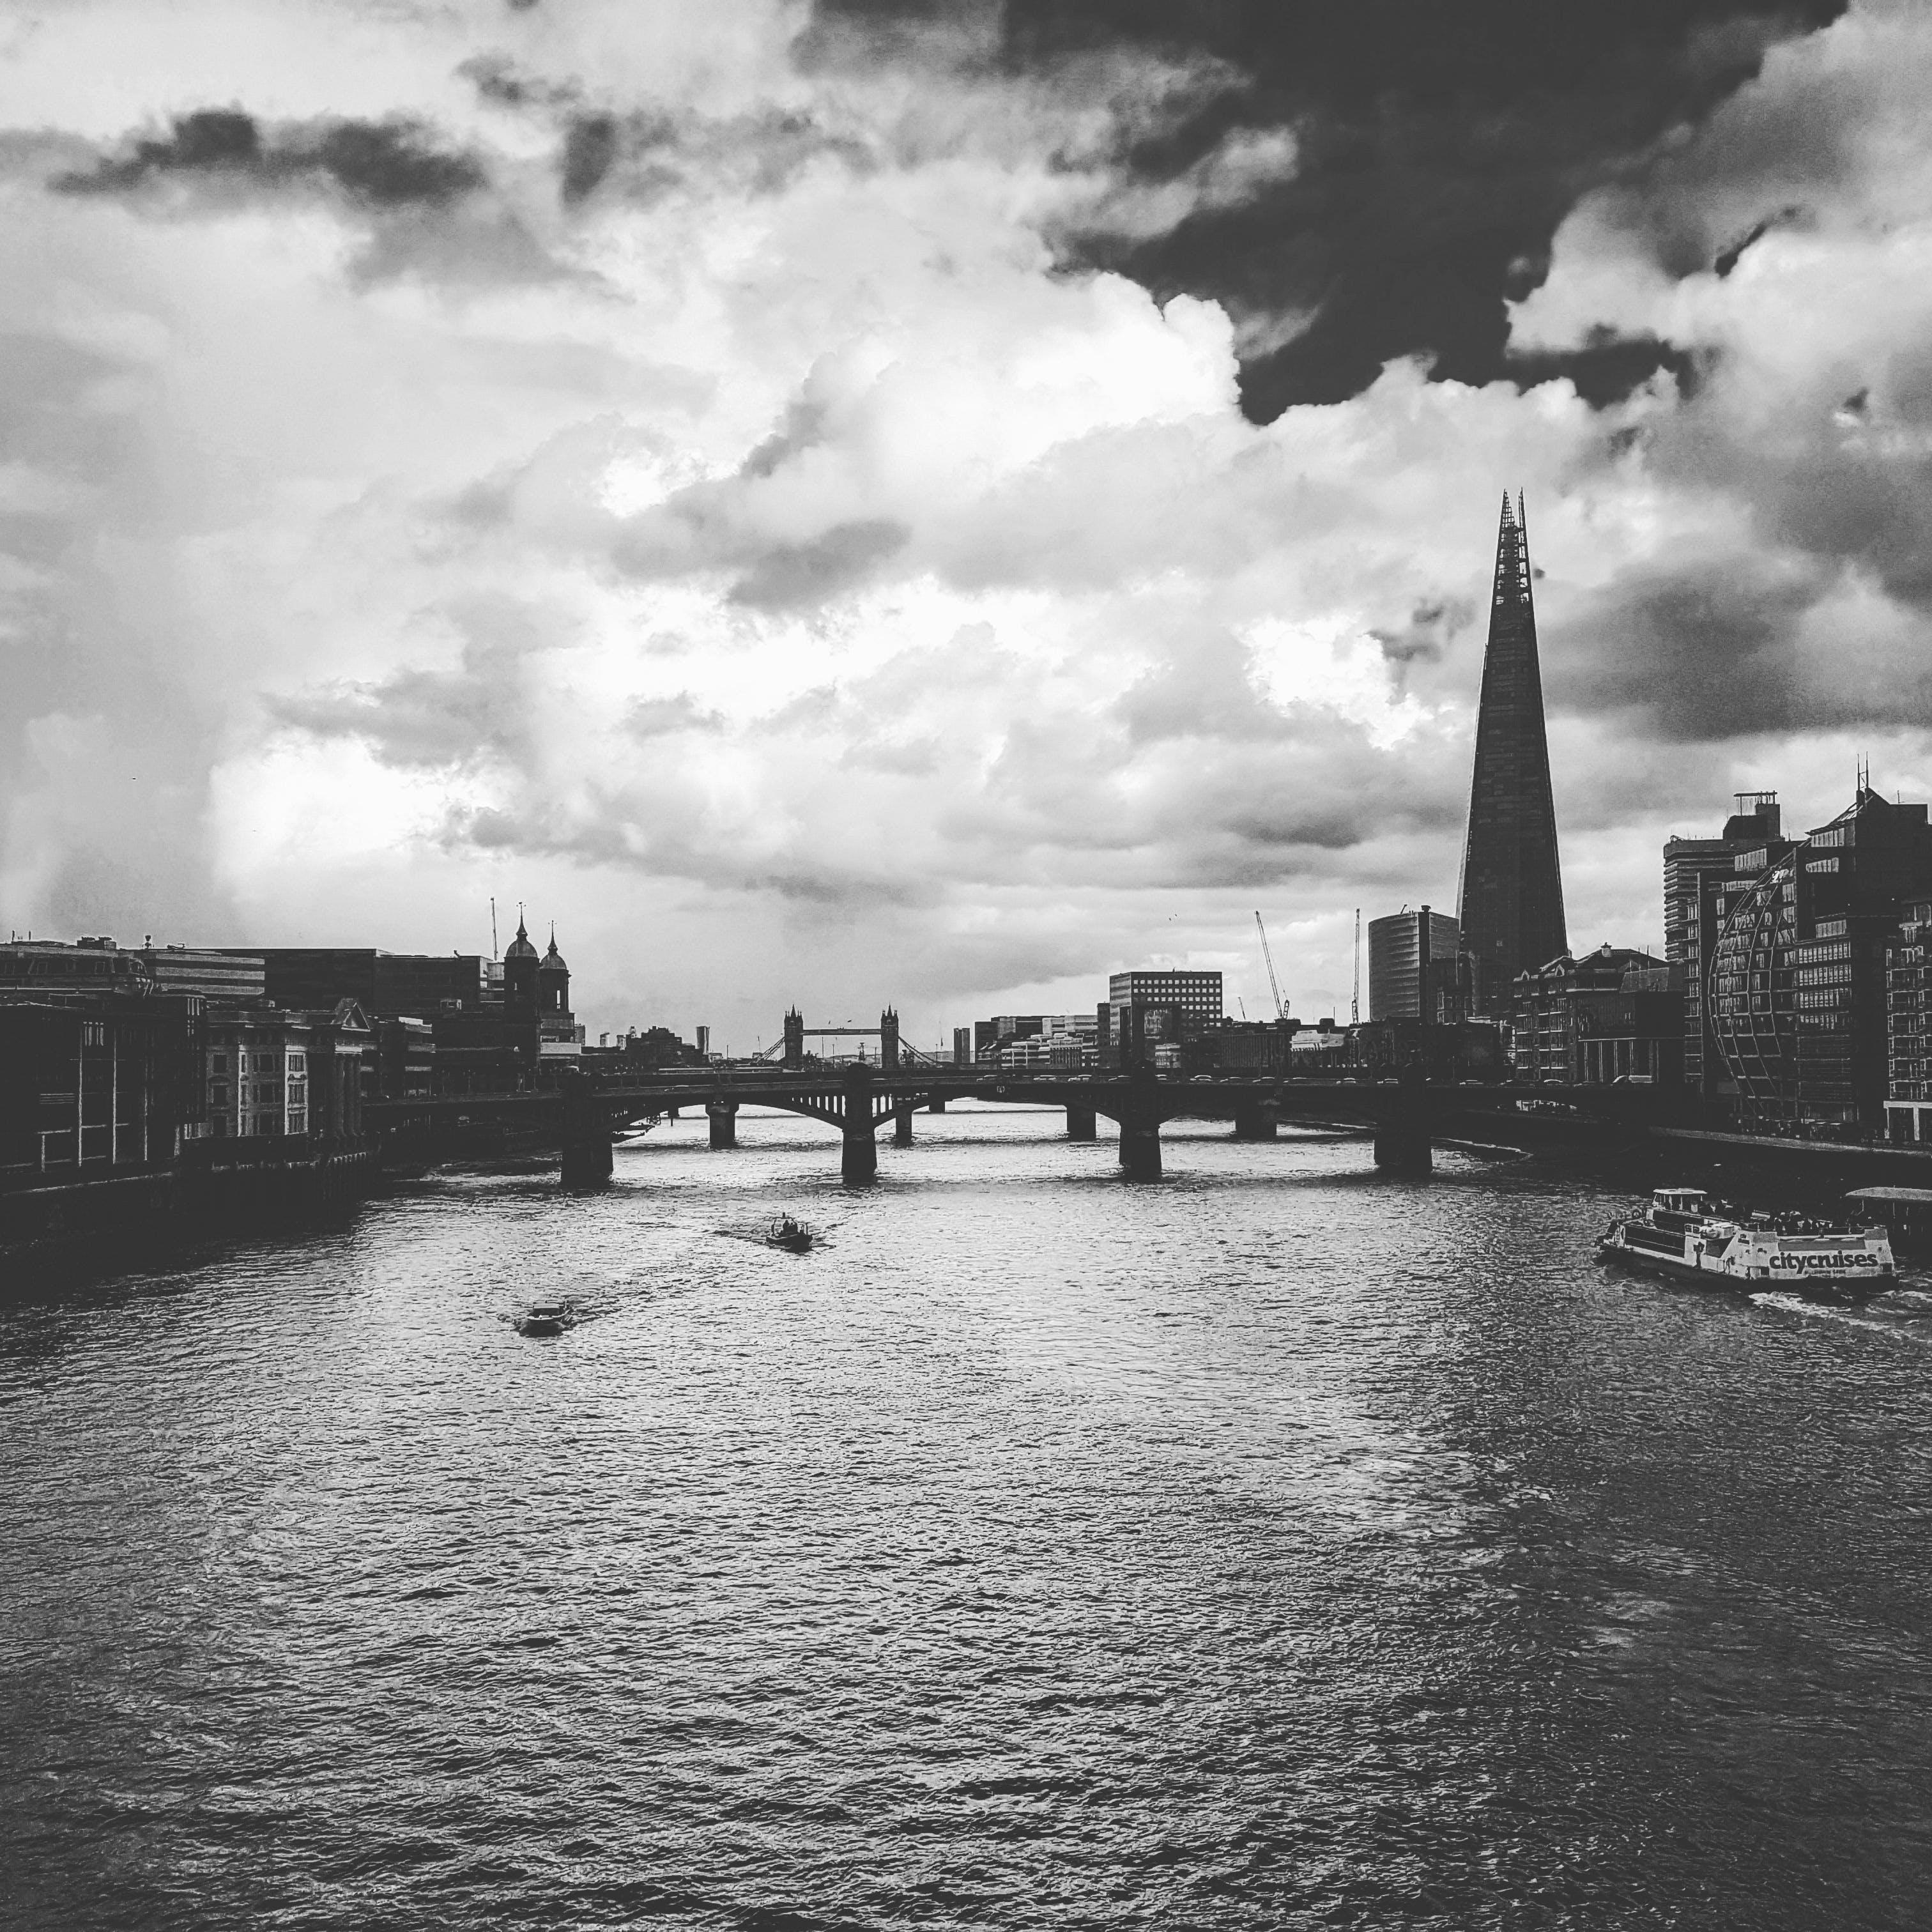 Free stock photo of black and white, bridge, cloud, cloudy sky